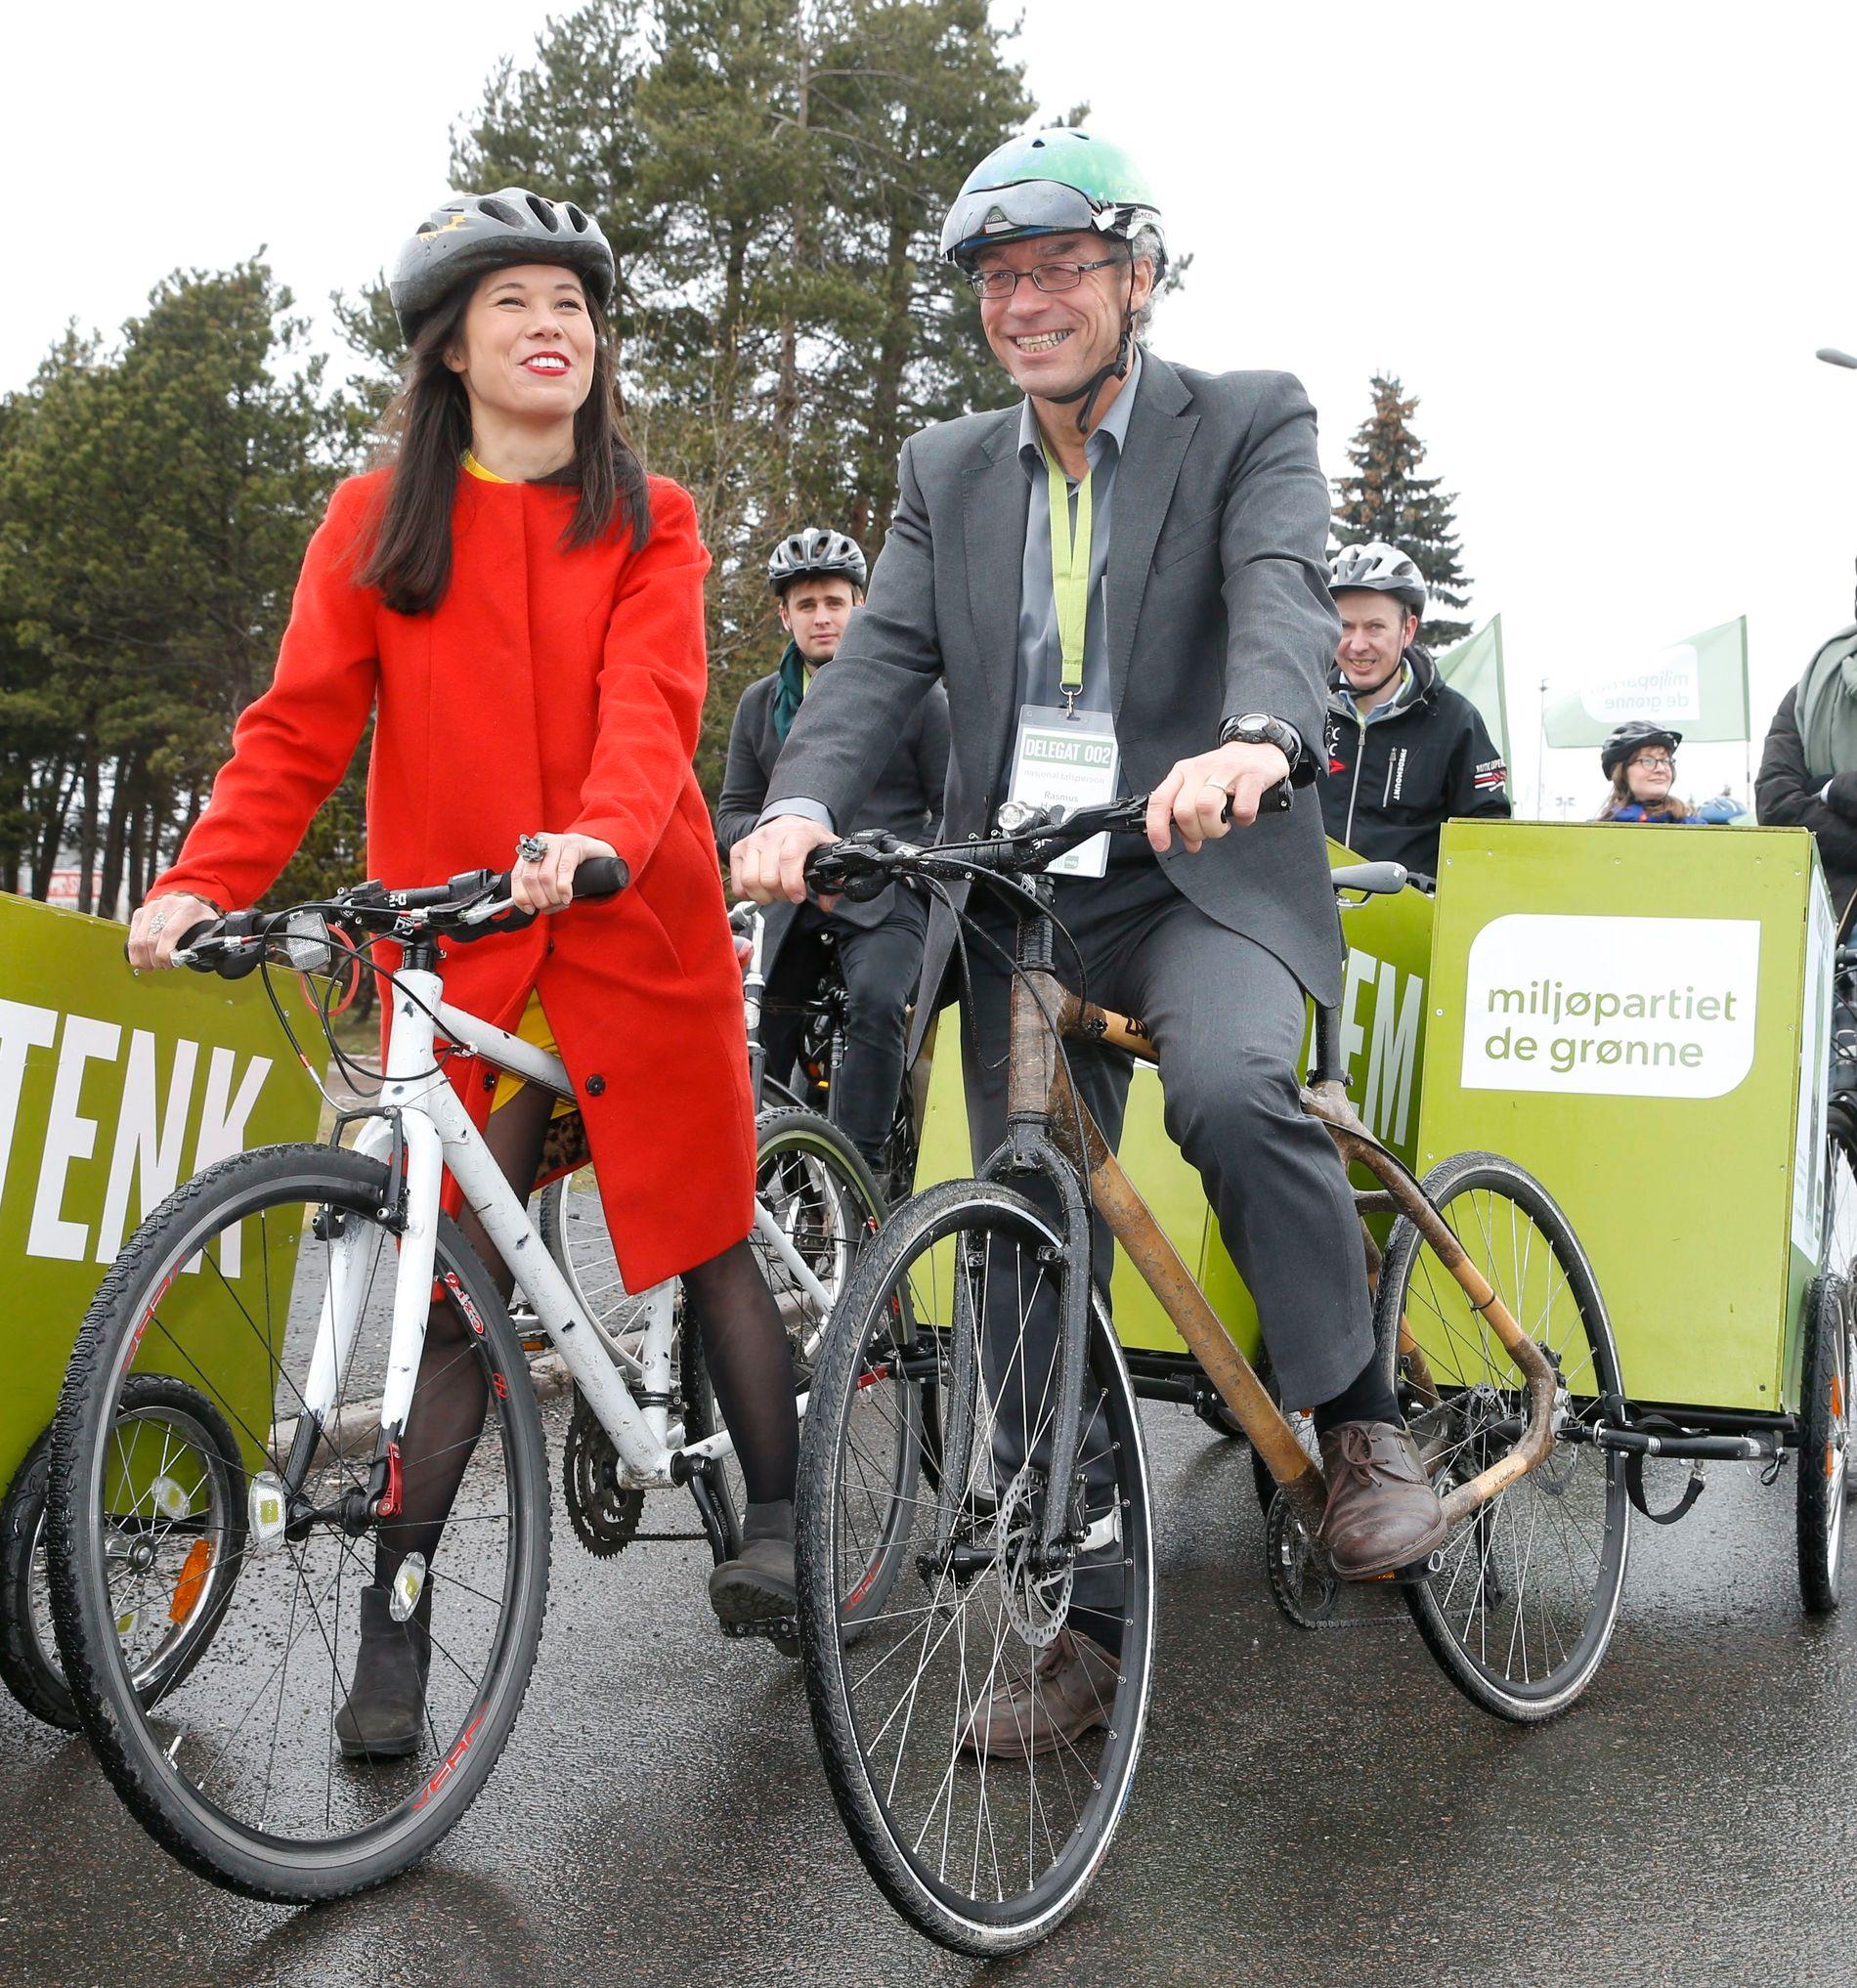 GODT EKSEMPEL: Miljøpartiet De Grønnes Lan Nguyen Berg og Rasmus Hansson oppfordrer til å sykle . Her ankommer de partiets landsmøte i vår. Lan Nguyen Berg er miljø og samferdselsbyråd i Oslo, Hansson er partiets talsperson.